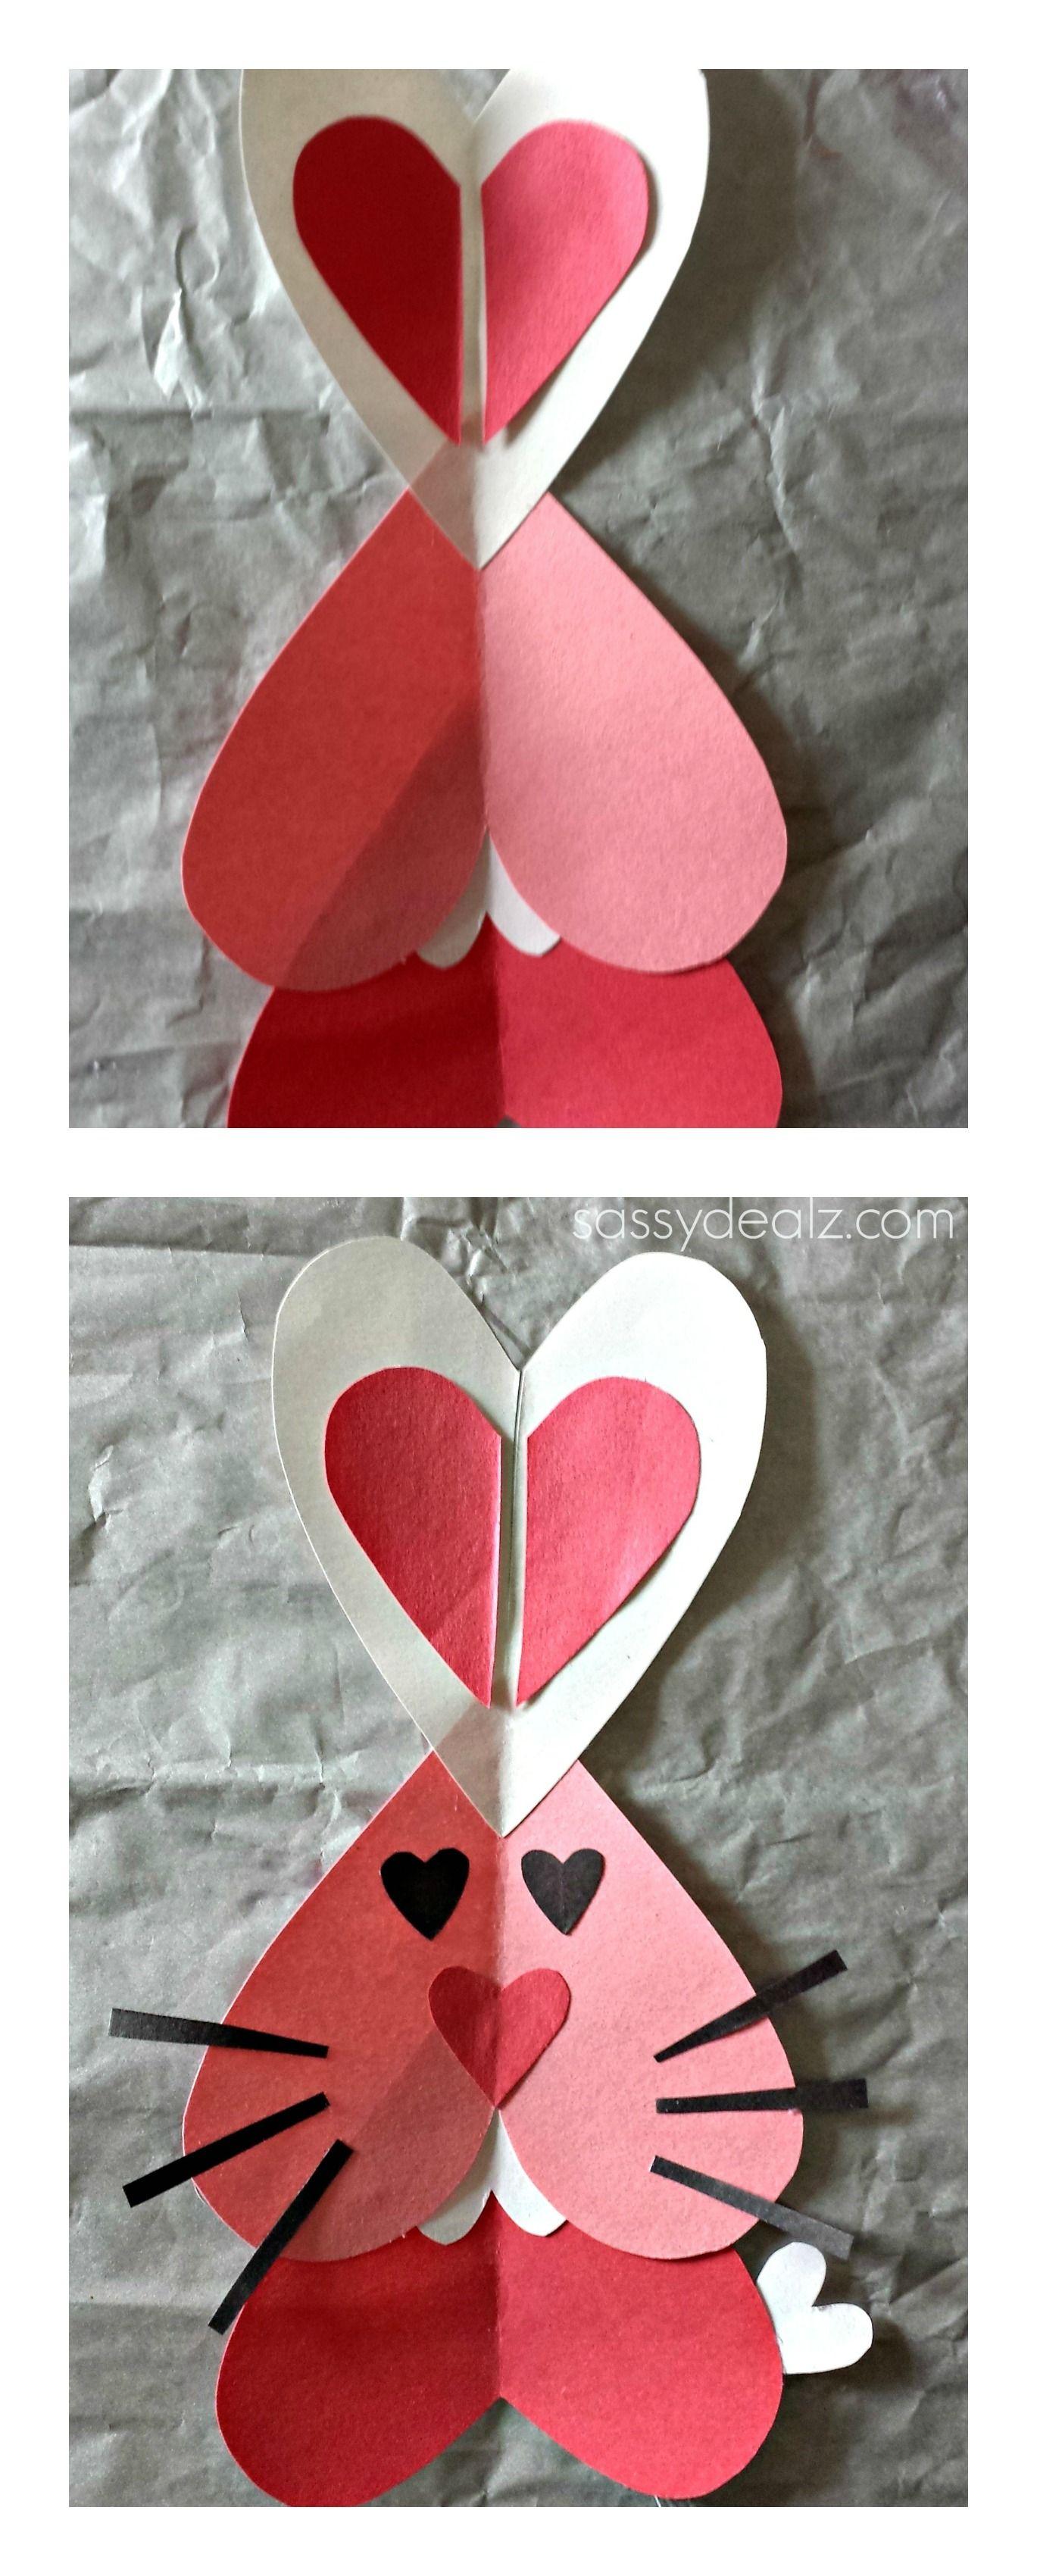 Heart bunny rabbit craft for kids valentines day art project heart bunny rabbit craft for kids valentines day art project heart shaped animal jeuxipadfo Gallery